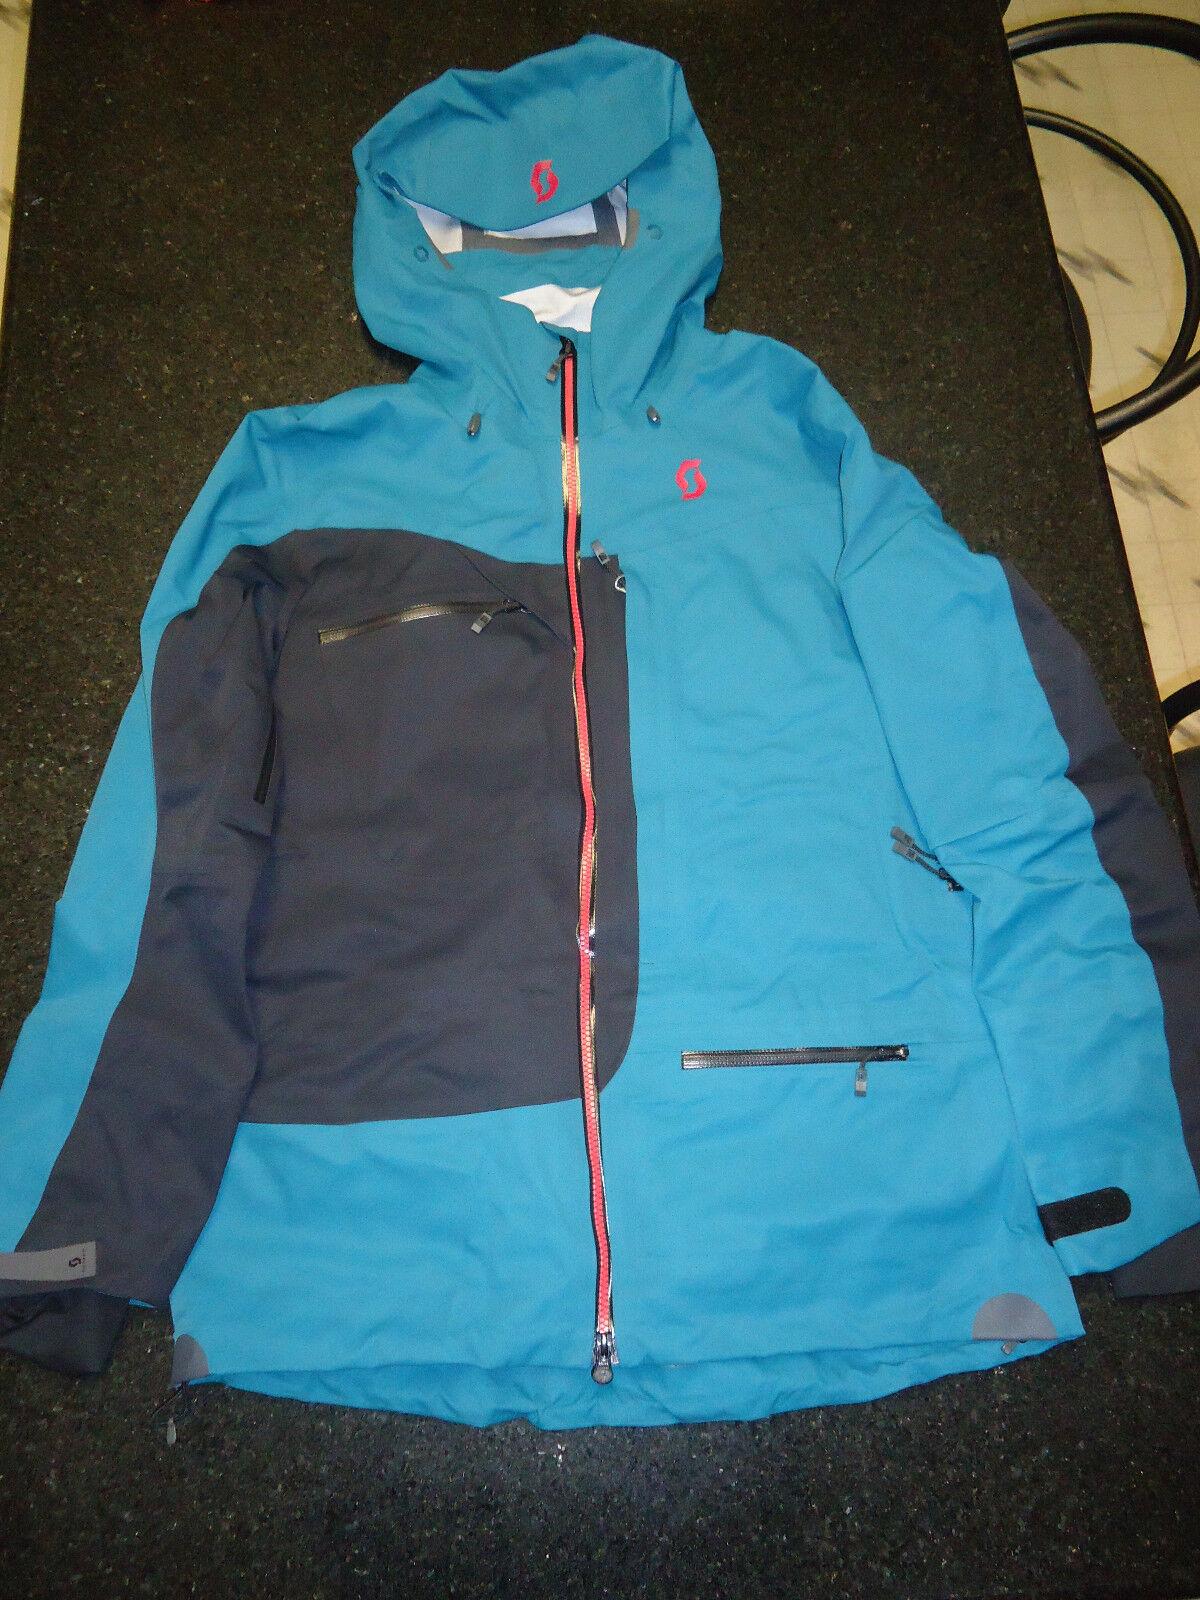 Scott verdeic 3 L Snowboard Chaqueta de esquí con capucha para mujer medio (M) SRP  349.99